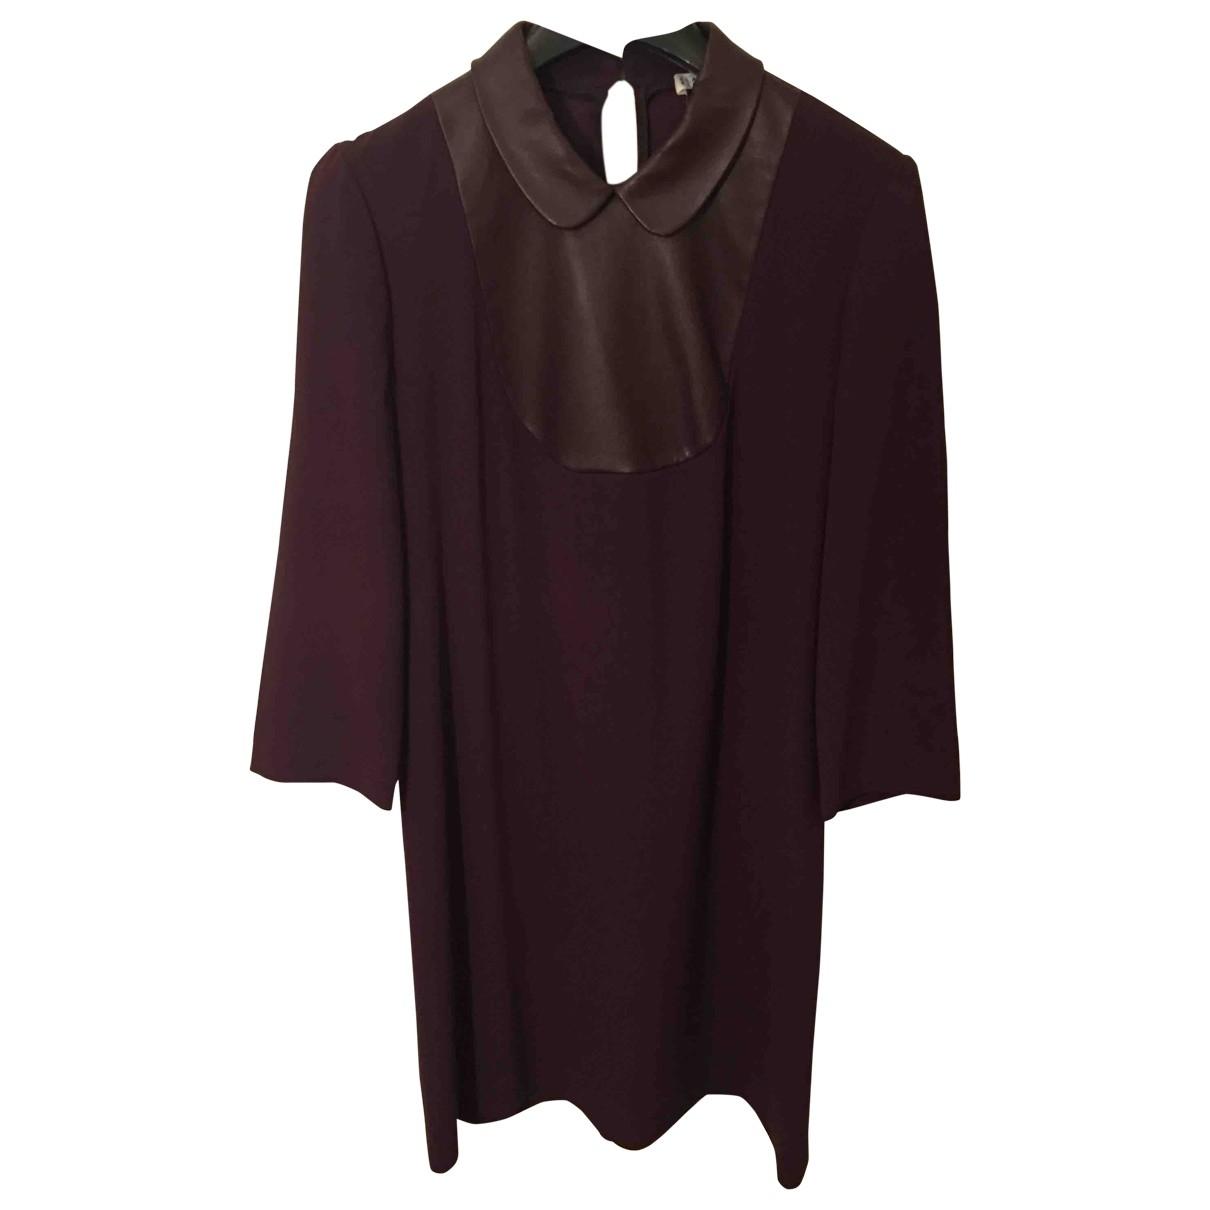 Claudie Pierlot \N Burgundy dress for Women 38 FR